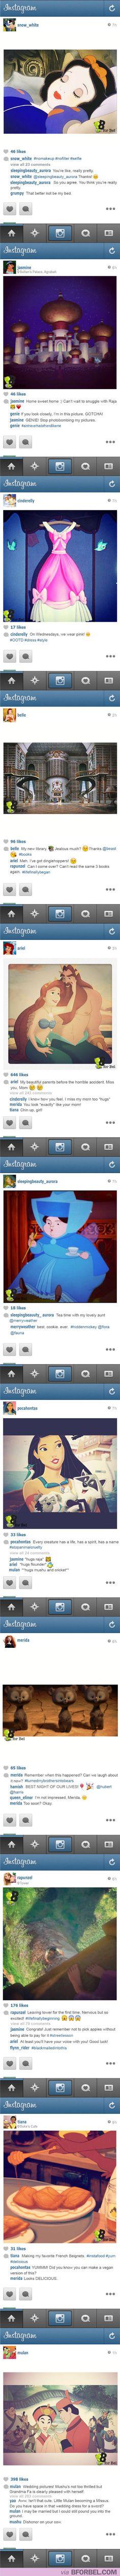 disney-princess-instagram-1